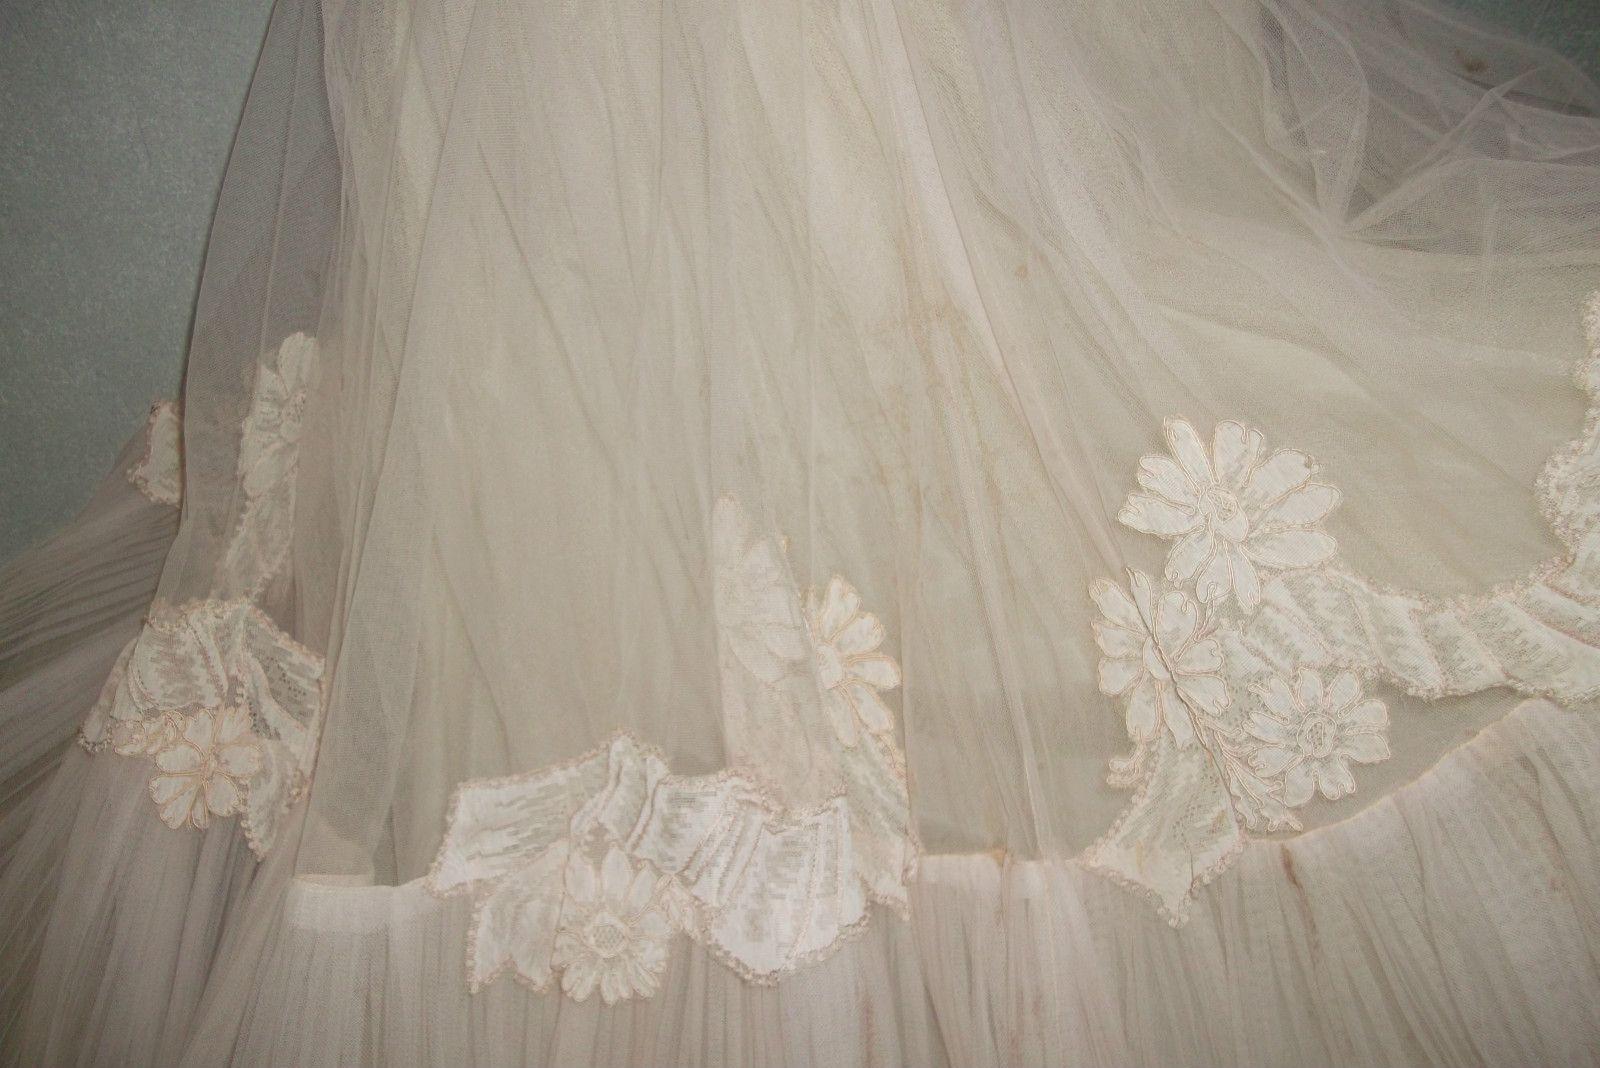 Vintage 50's Rockabilly Wedding Cocktail Dress Veil Sz 6 8 Blush Tulle Net | eBay